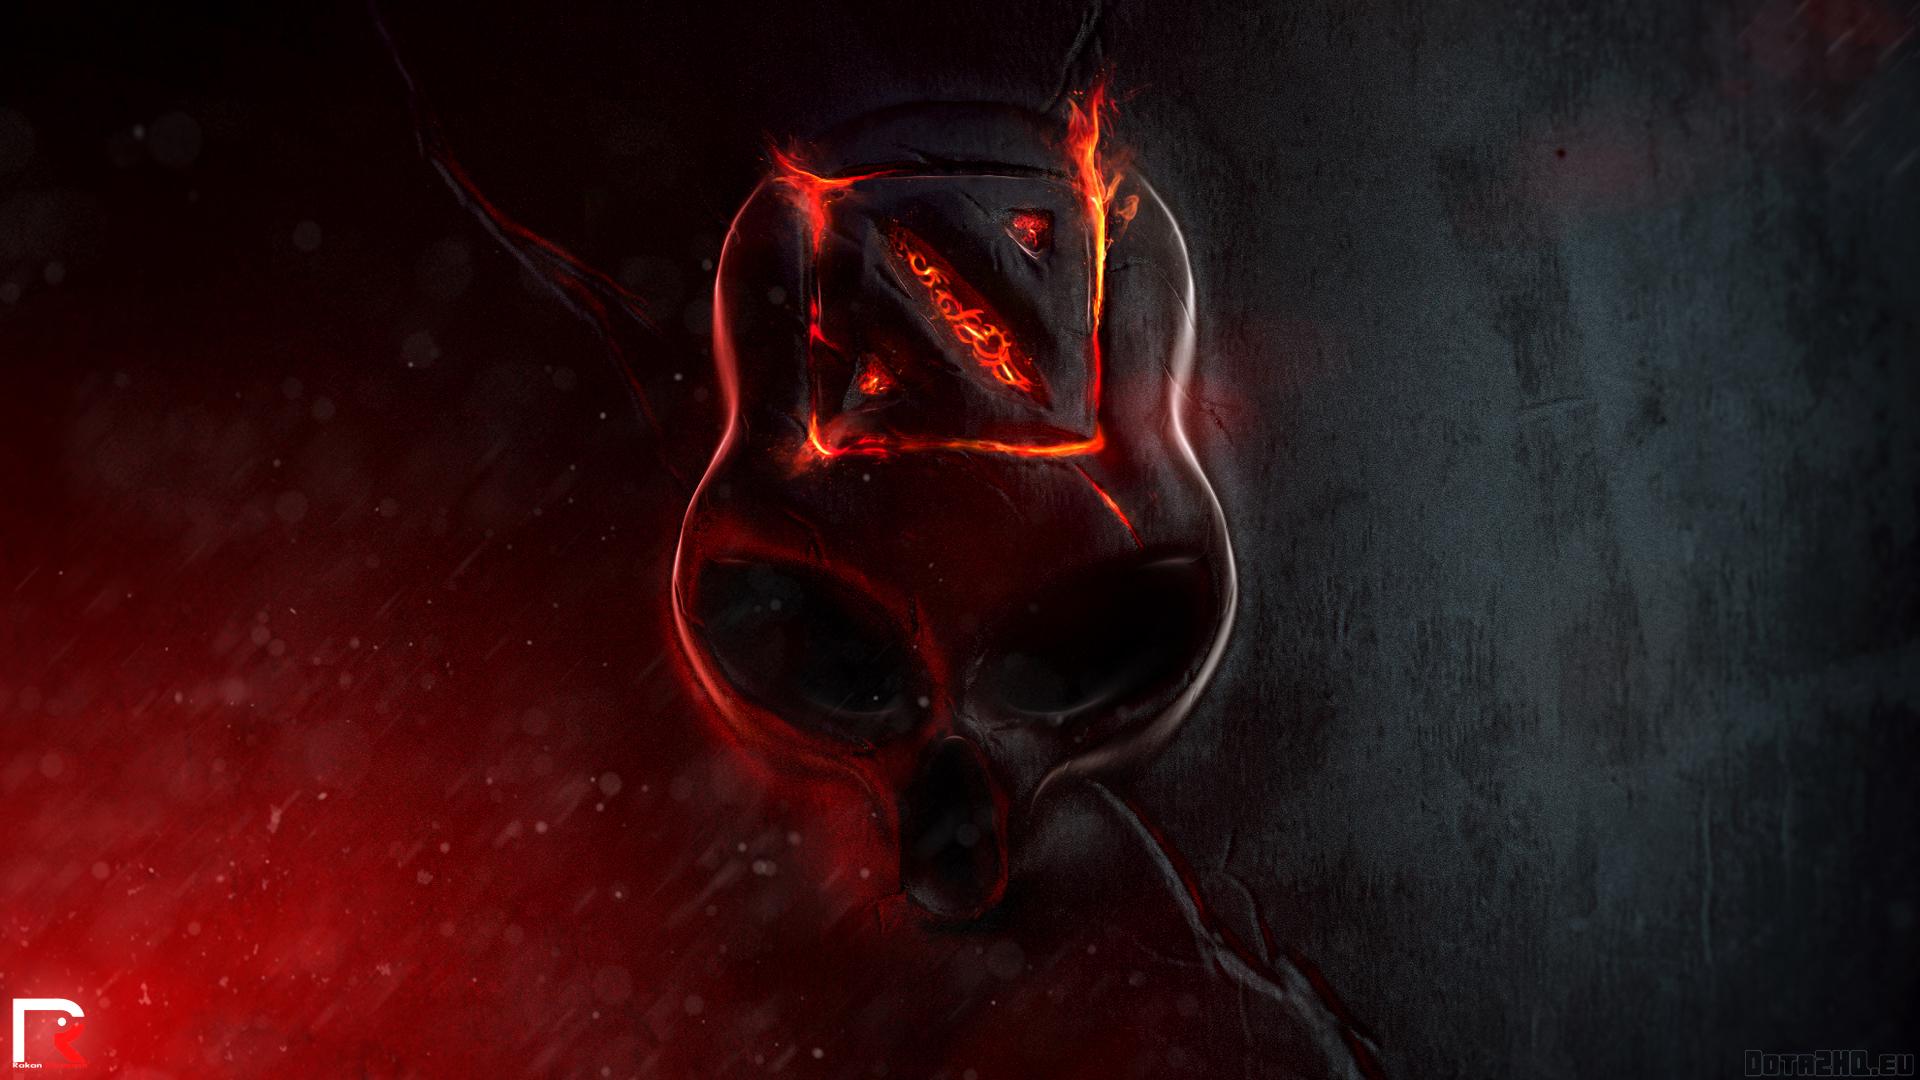 Wallpaper Illustration Red Logo Fire Skull Demon